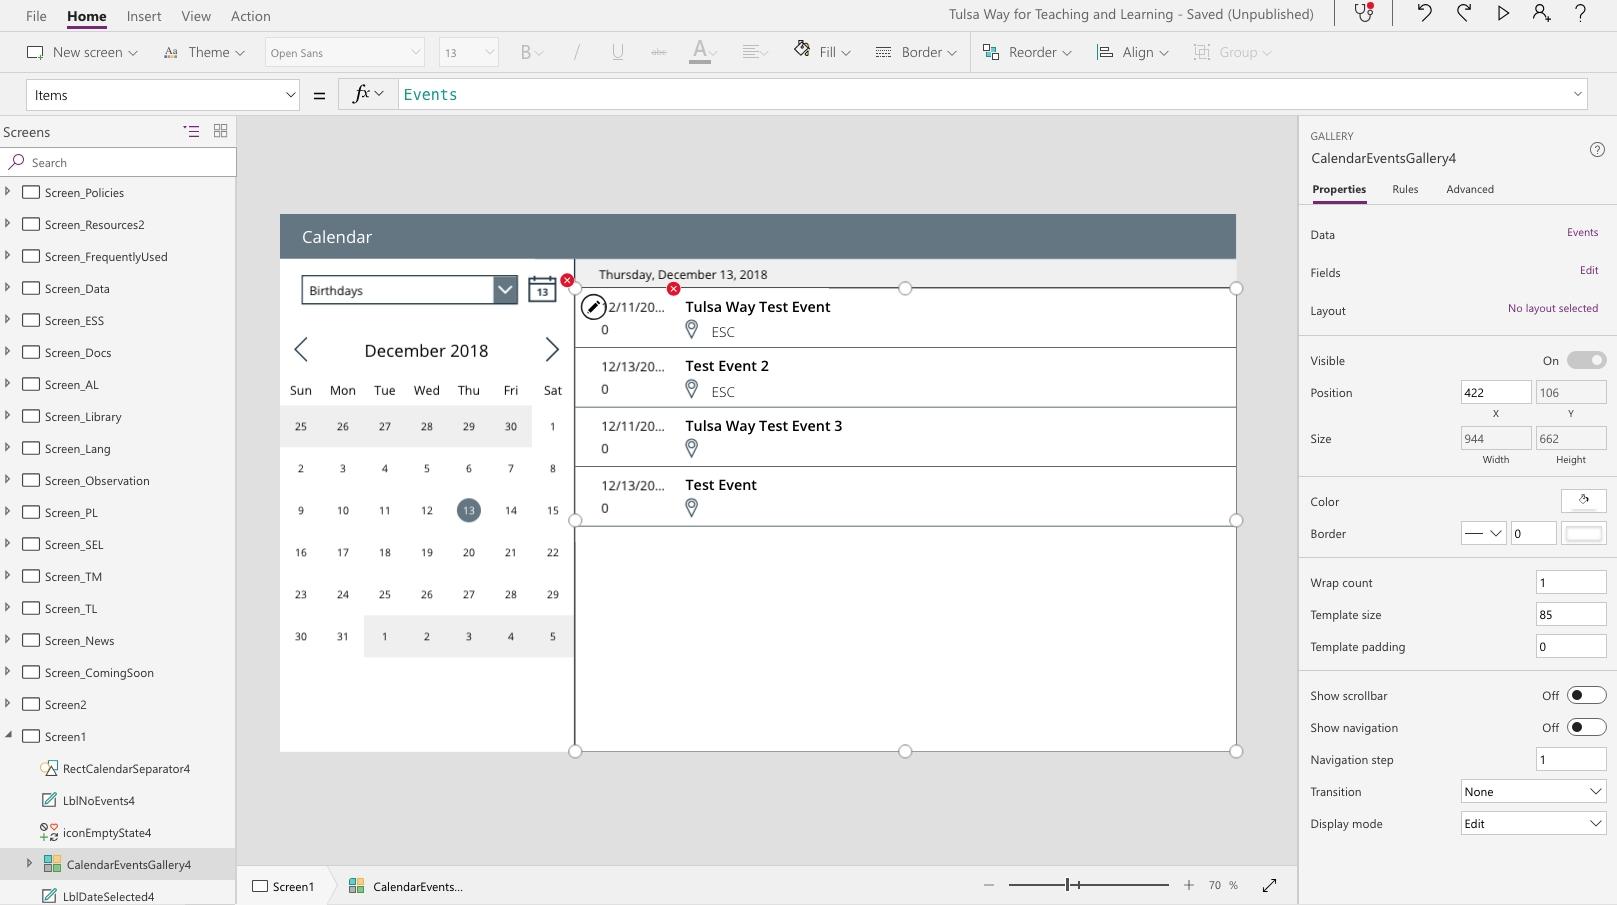 Sharepoint Calendar W/ Powerapps Calendar Template - Power Platform inside How To Display Image Of Sharepoint Calendar